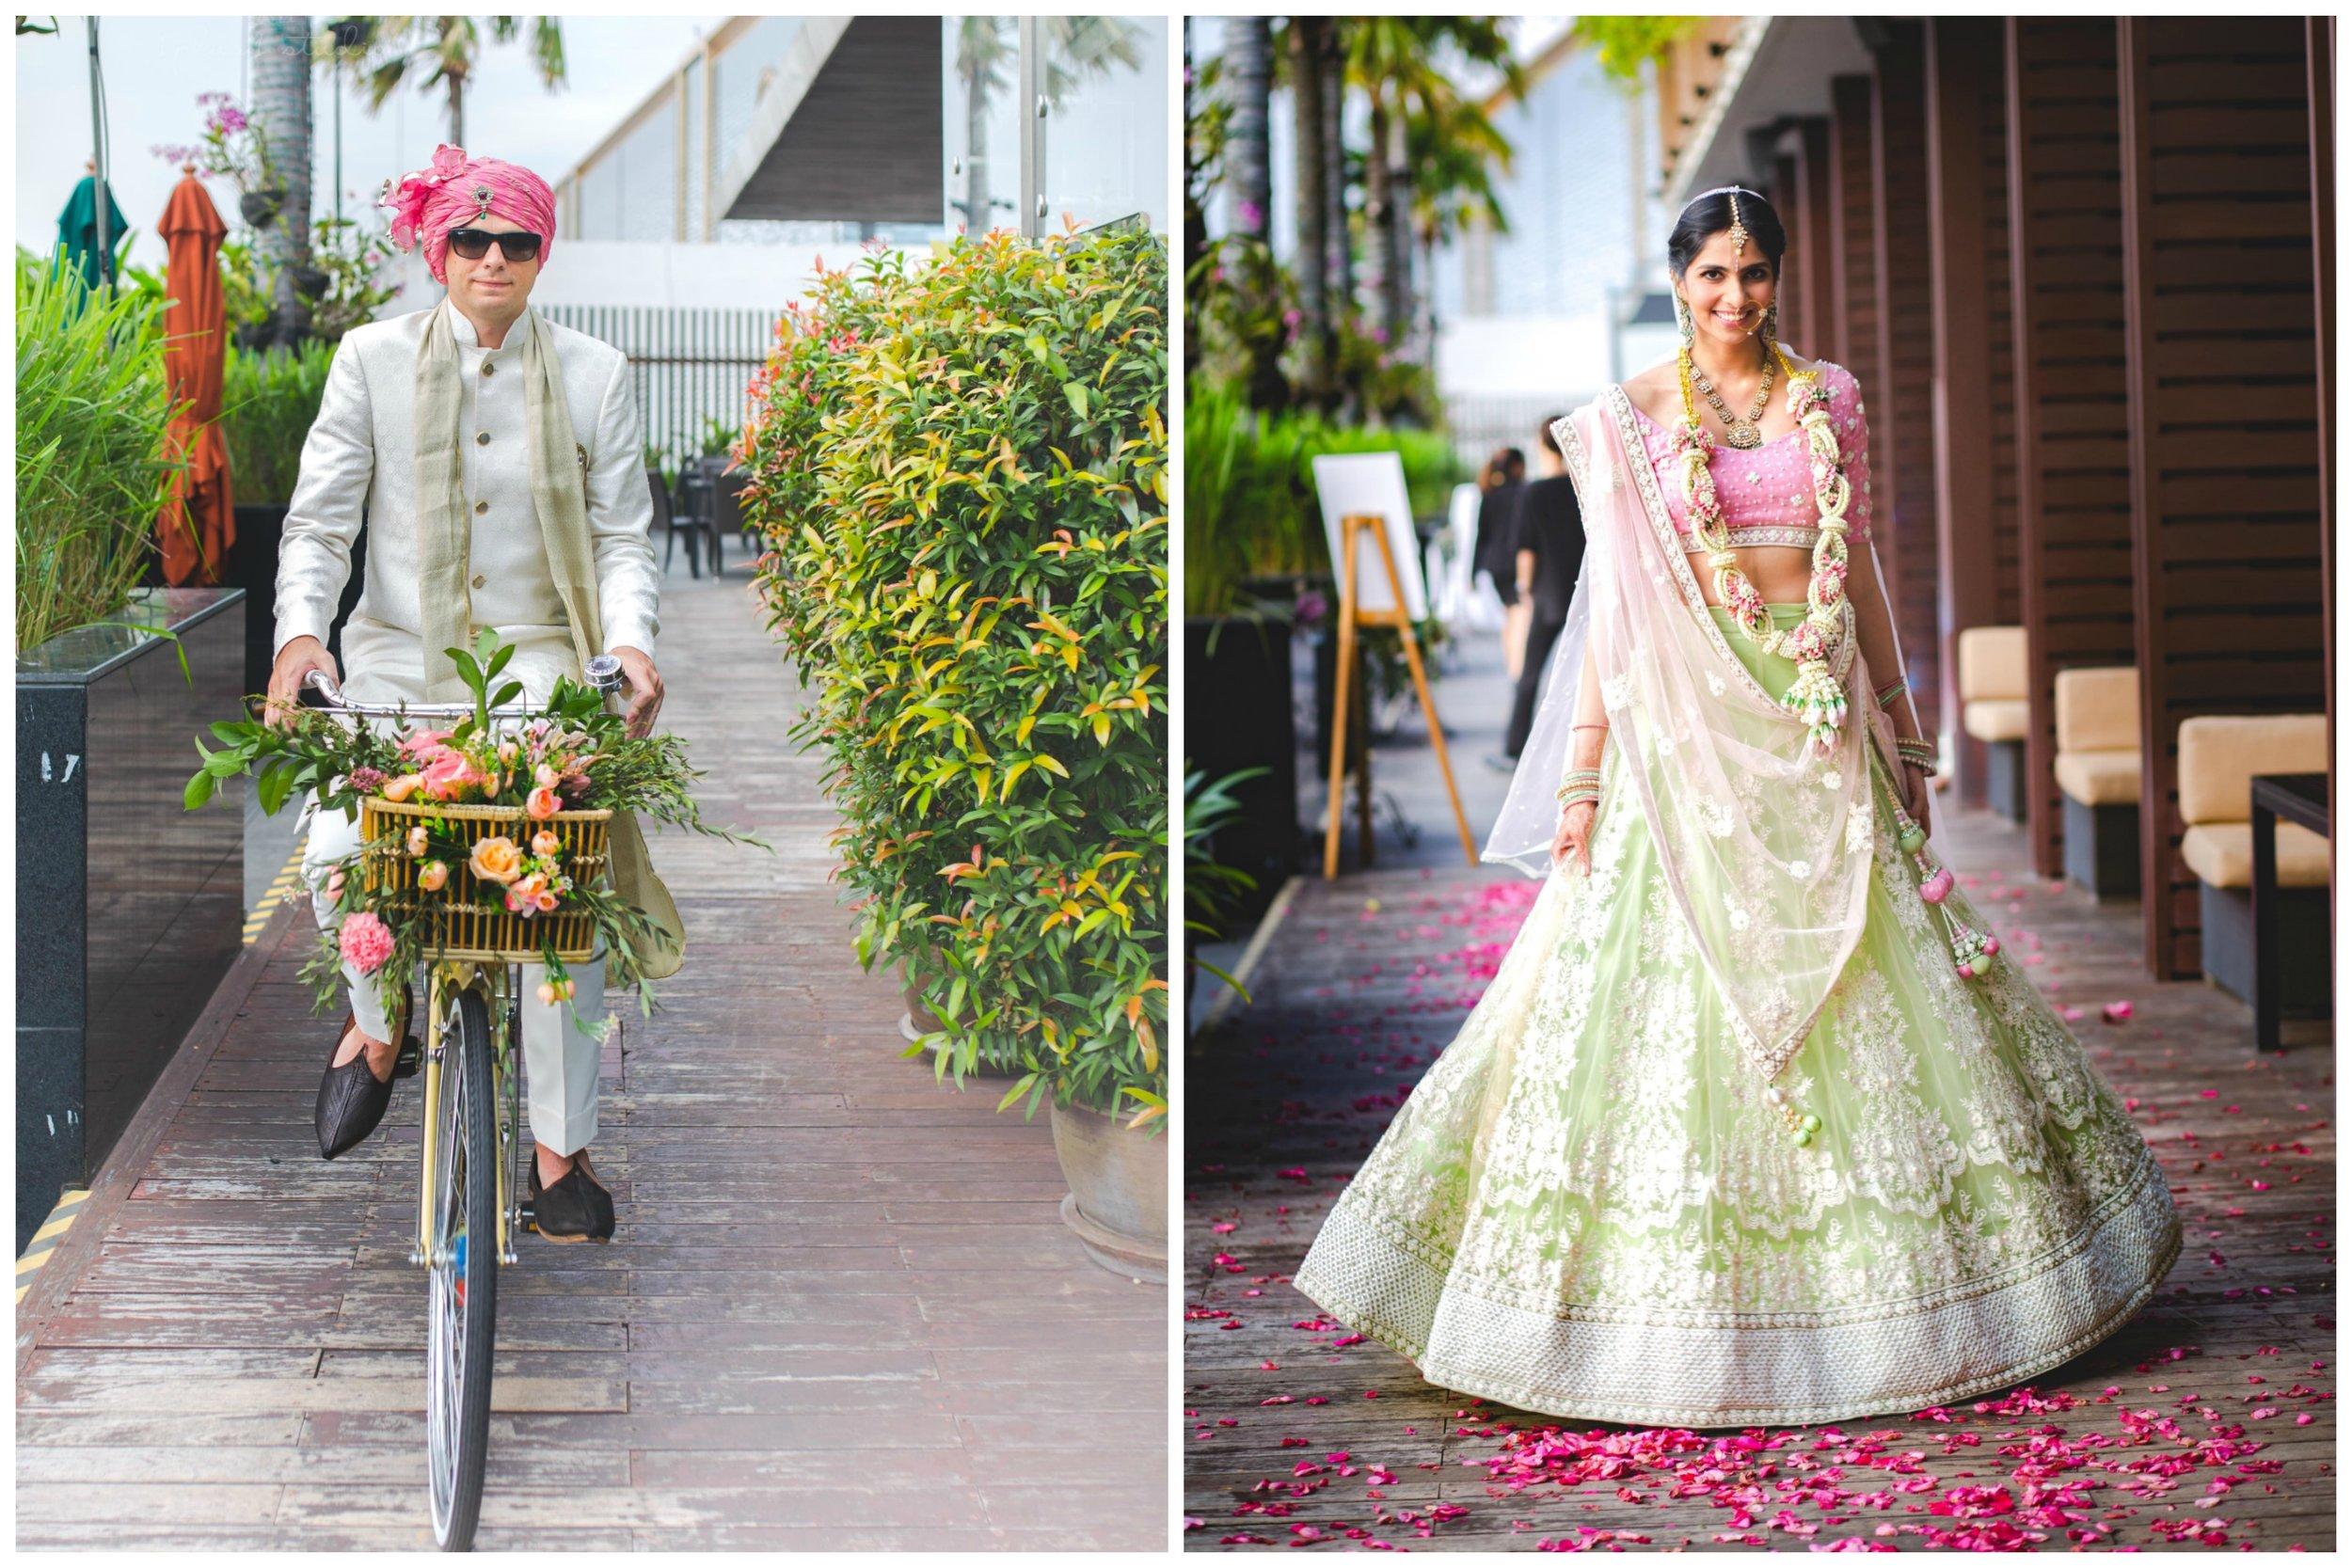 Bride & groom | Candid wedding photography.jpg